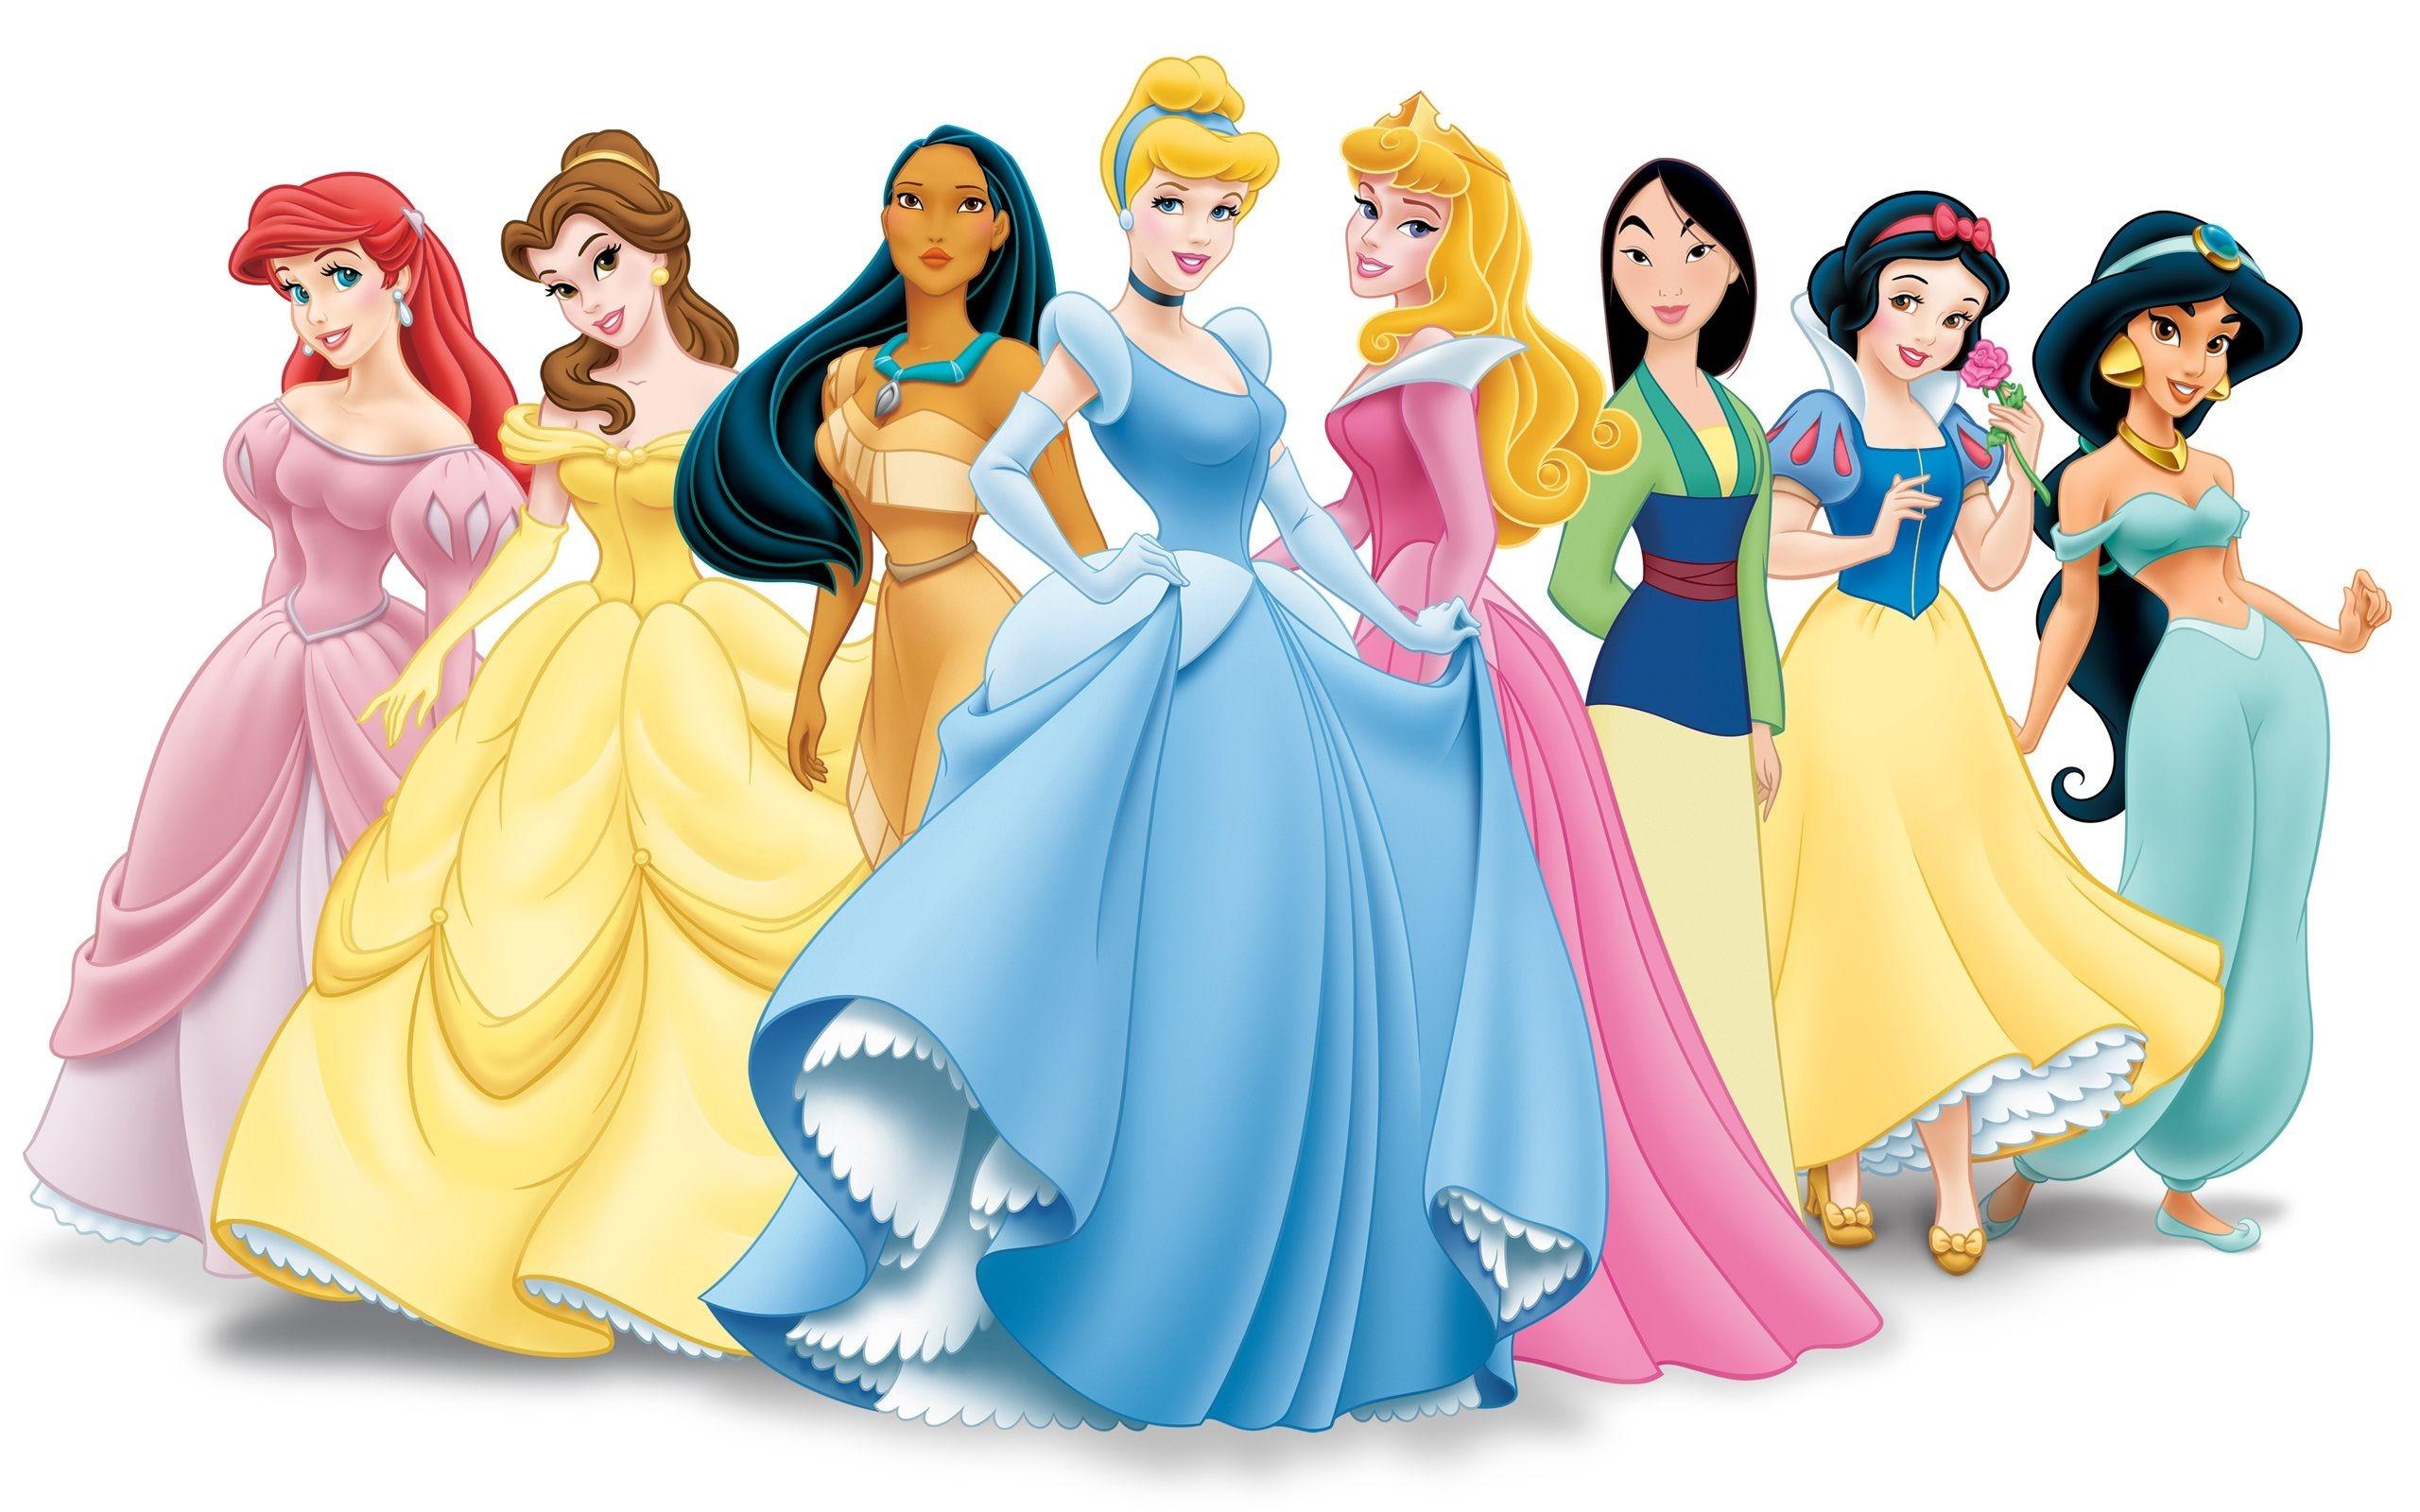 Disney Princess Wallpaper For the Bean